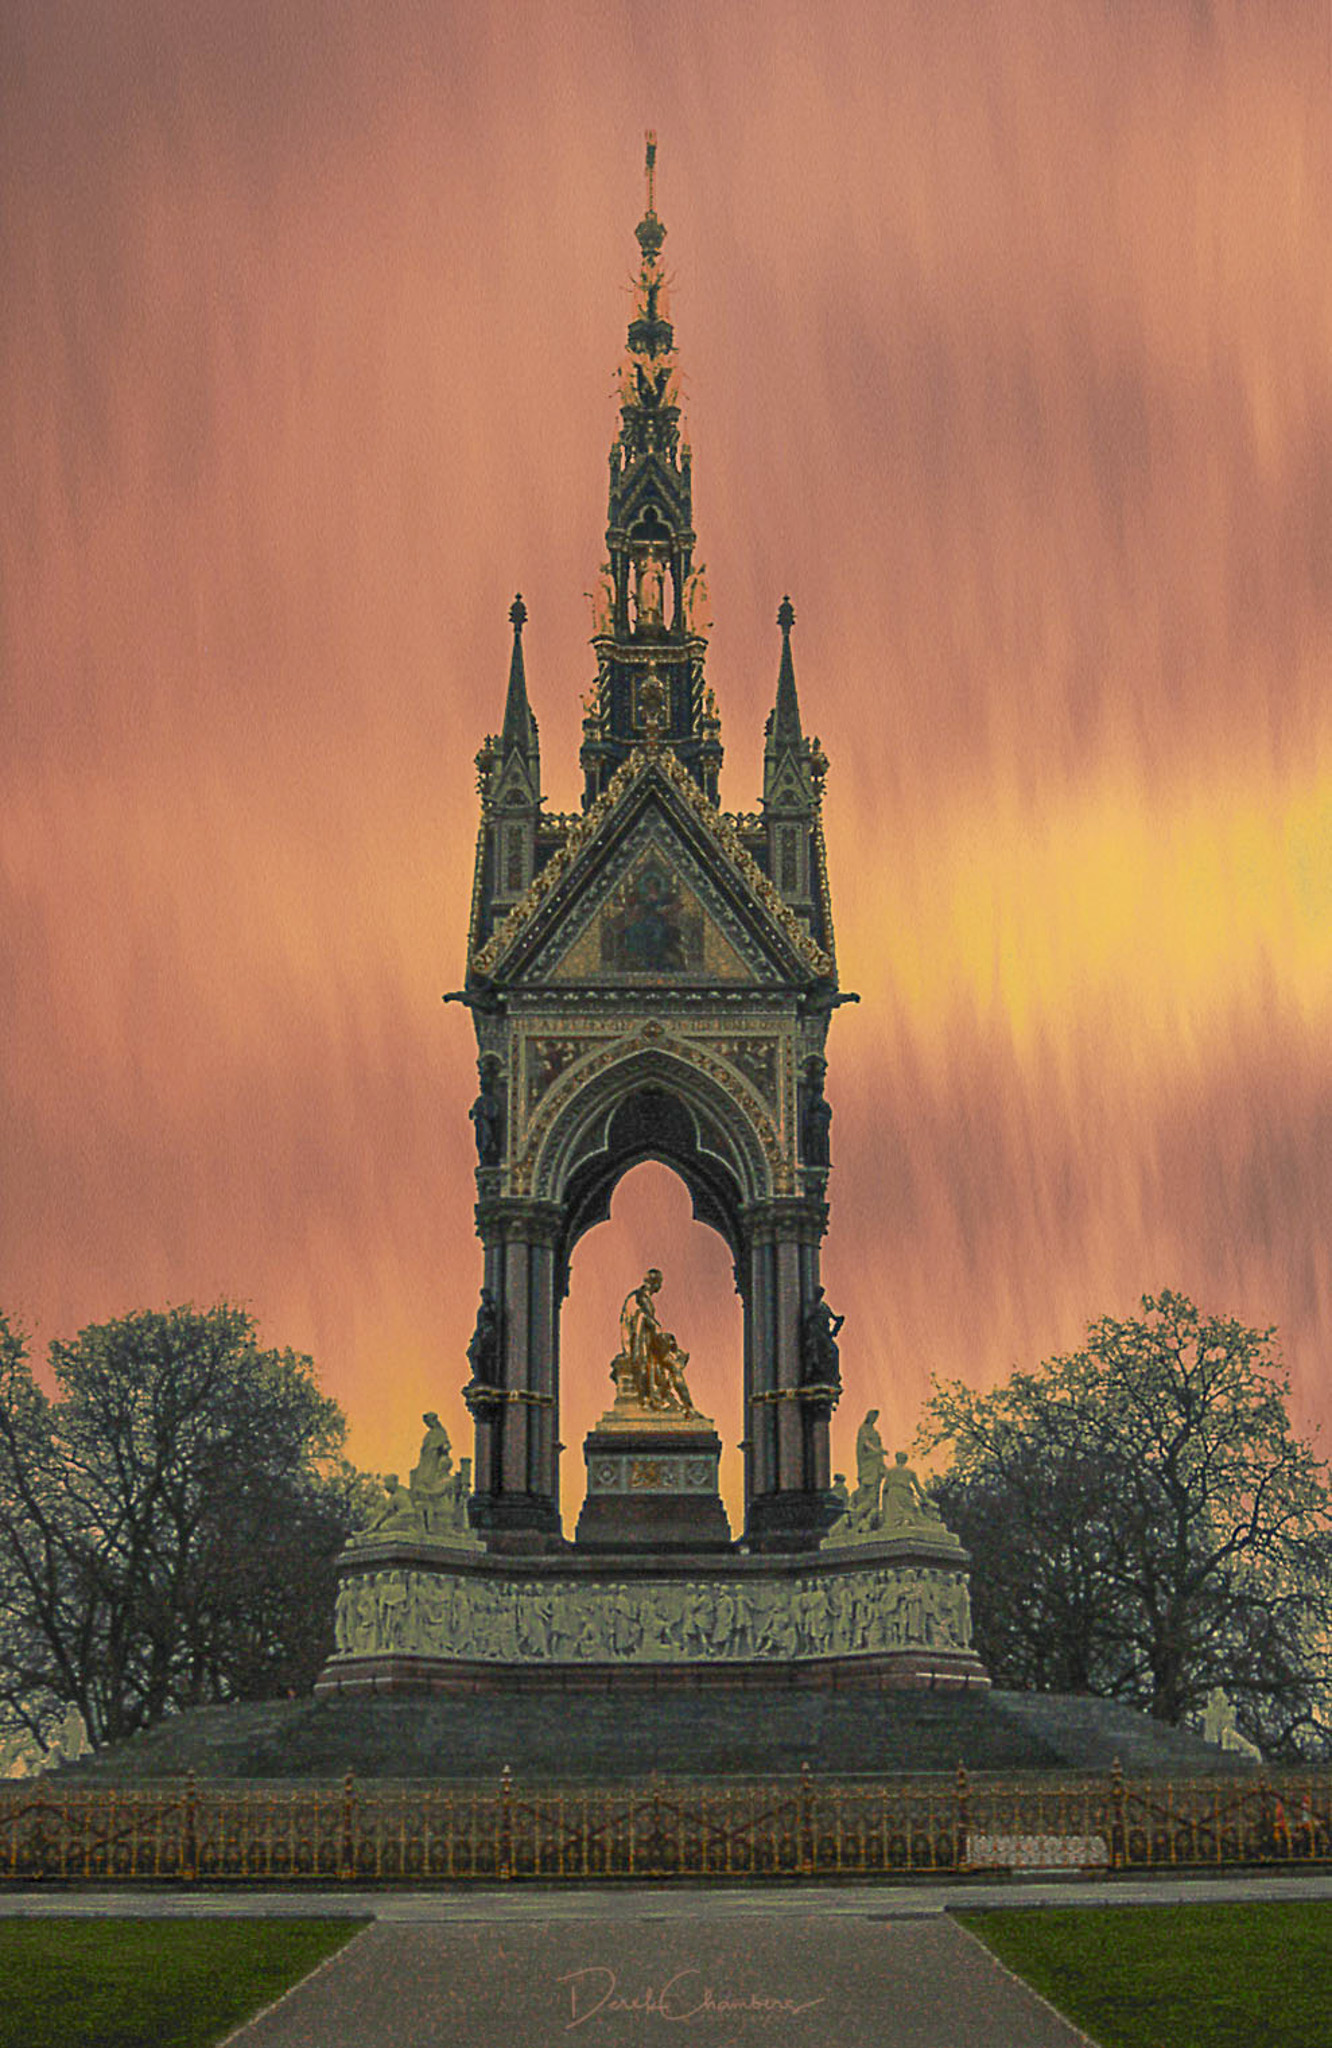 The Allbert Memorial - Derek Chambers